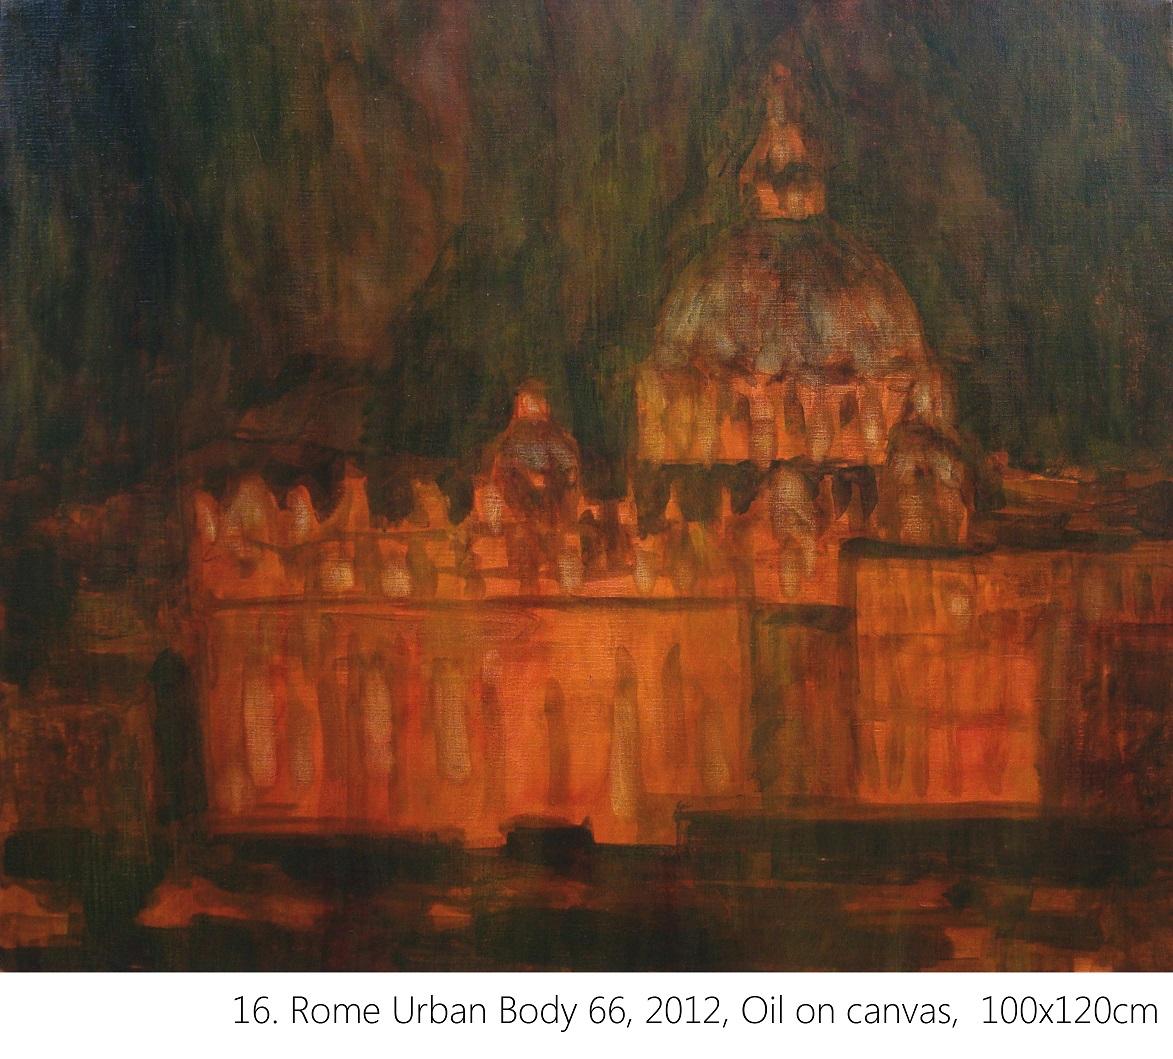 16. Rome Urban Body 66, 2012, Oil on canvas, 100x120cm